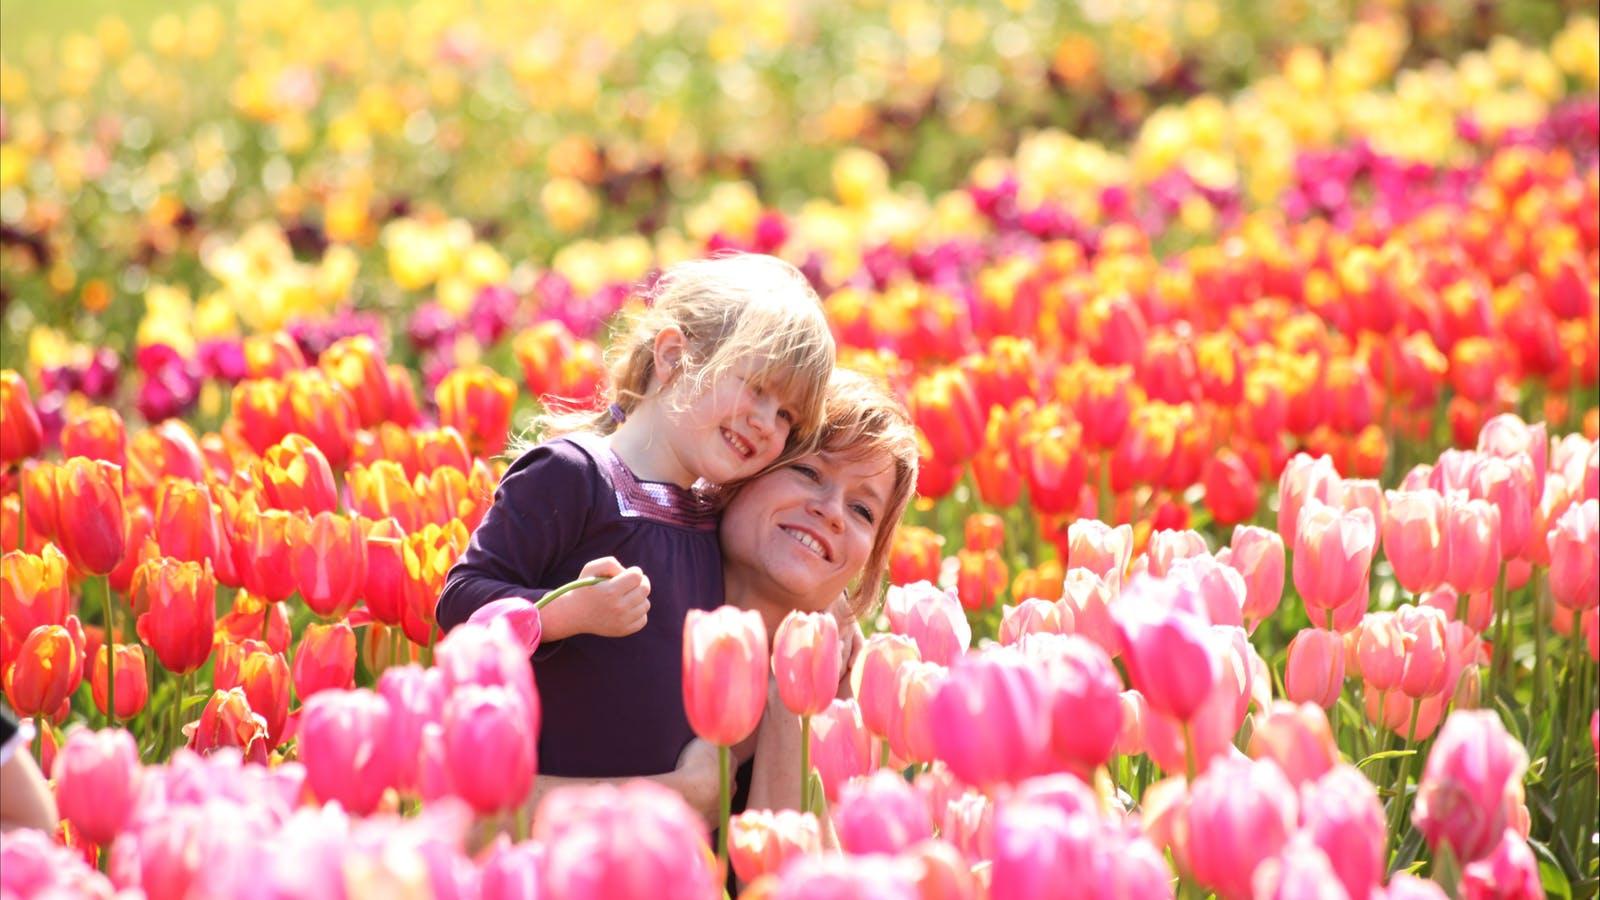 Plenty of family fun at the Tesselaar Tulip Festival